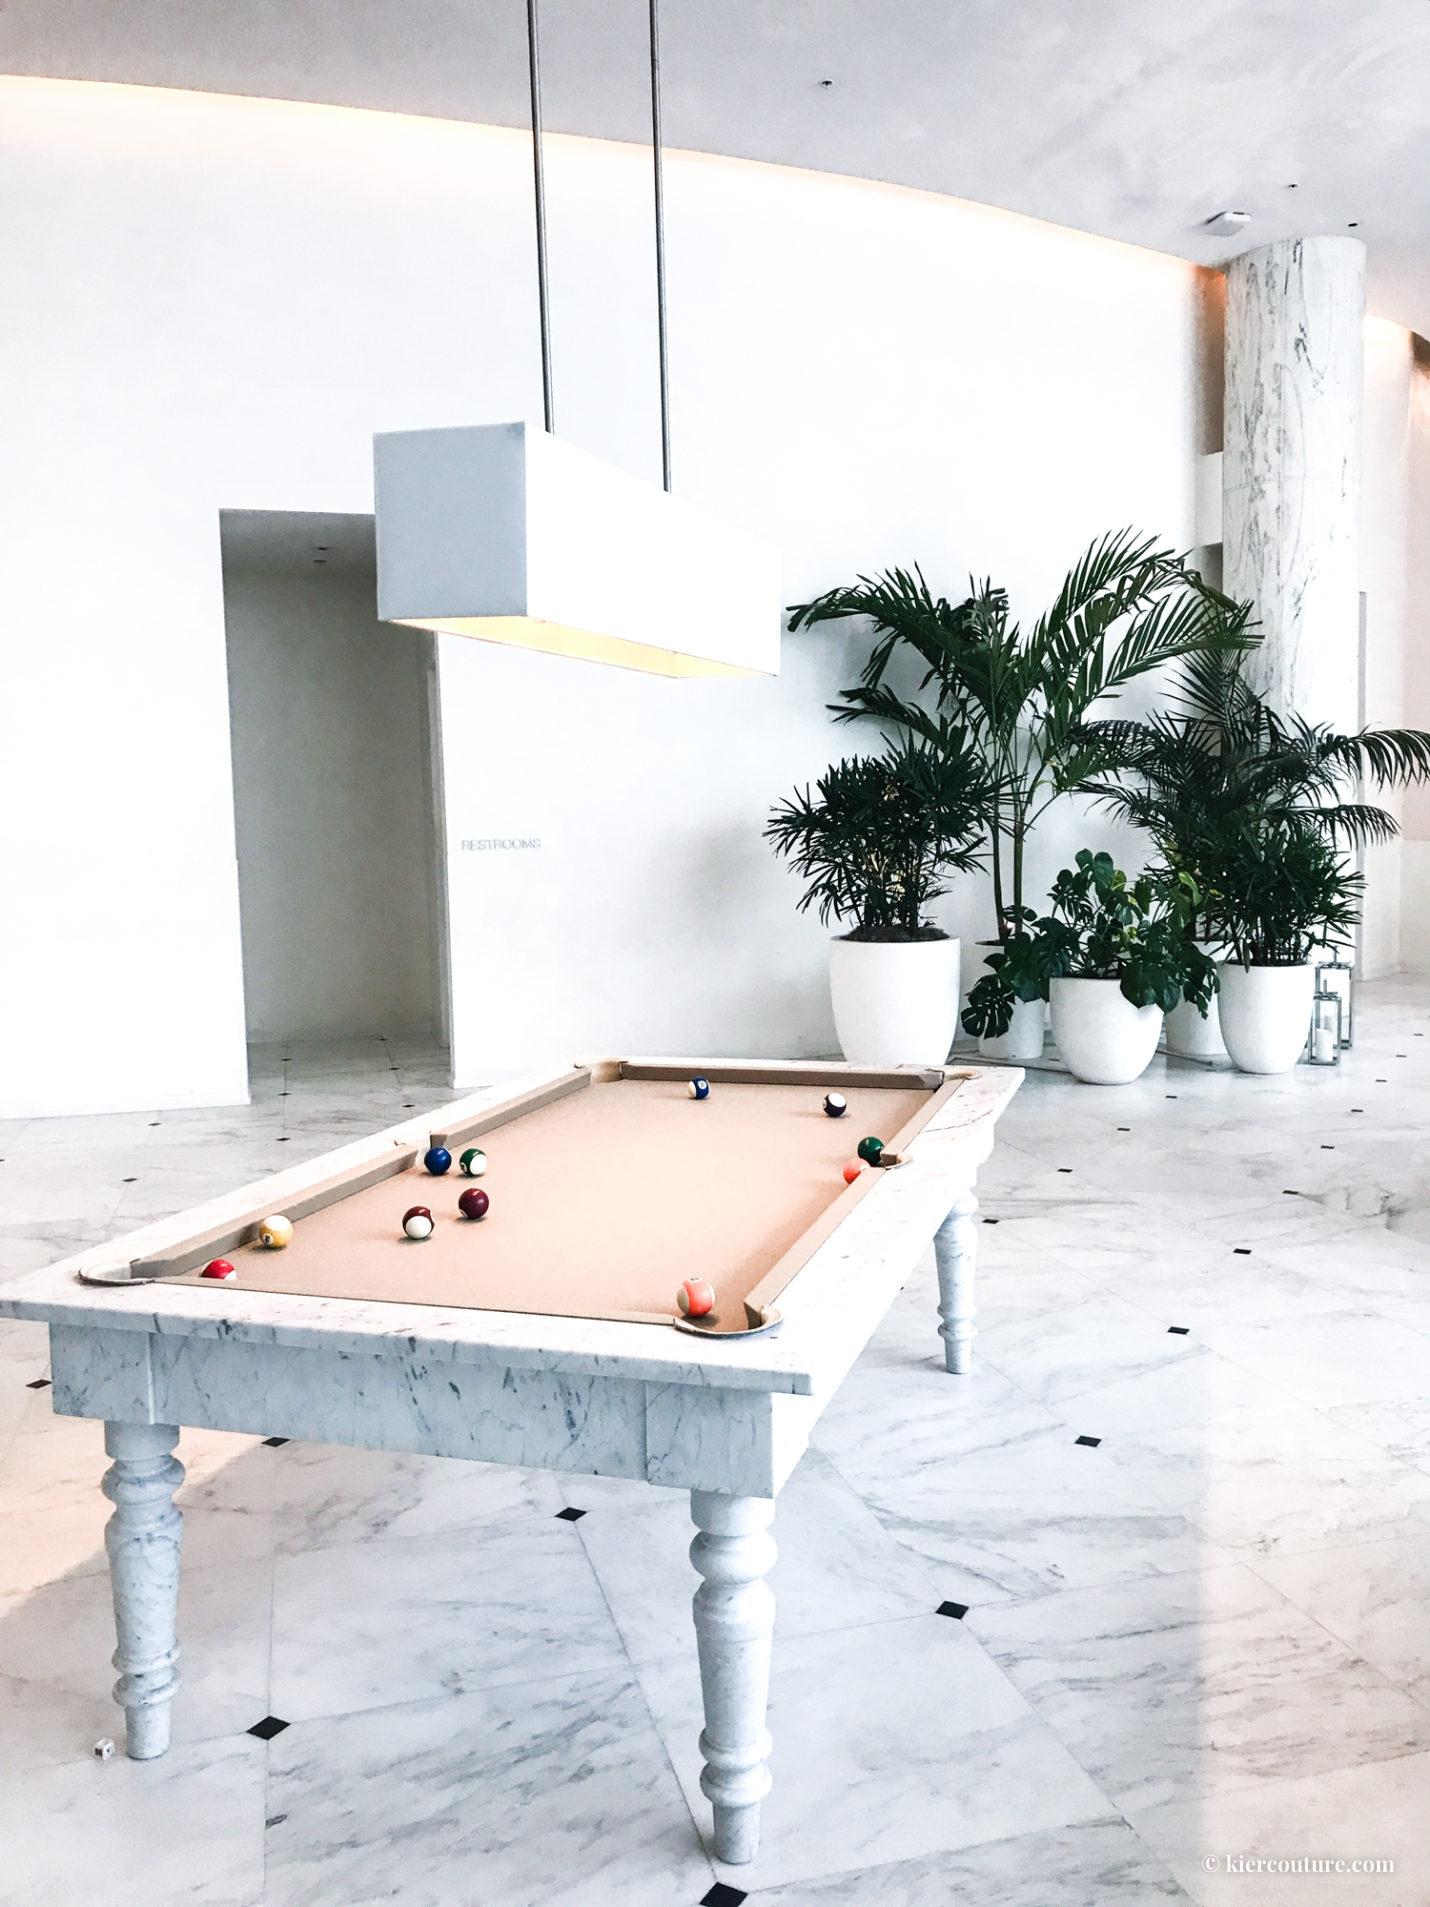 Miami beach edition hotel lobby